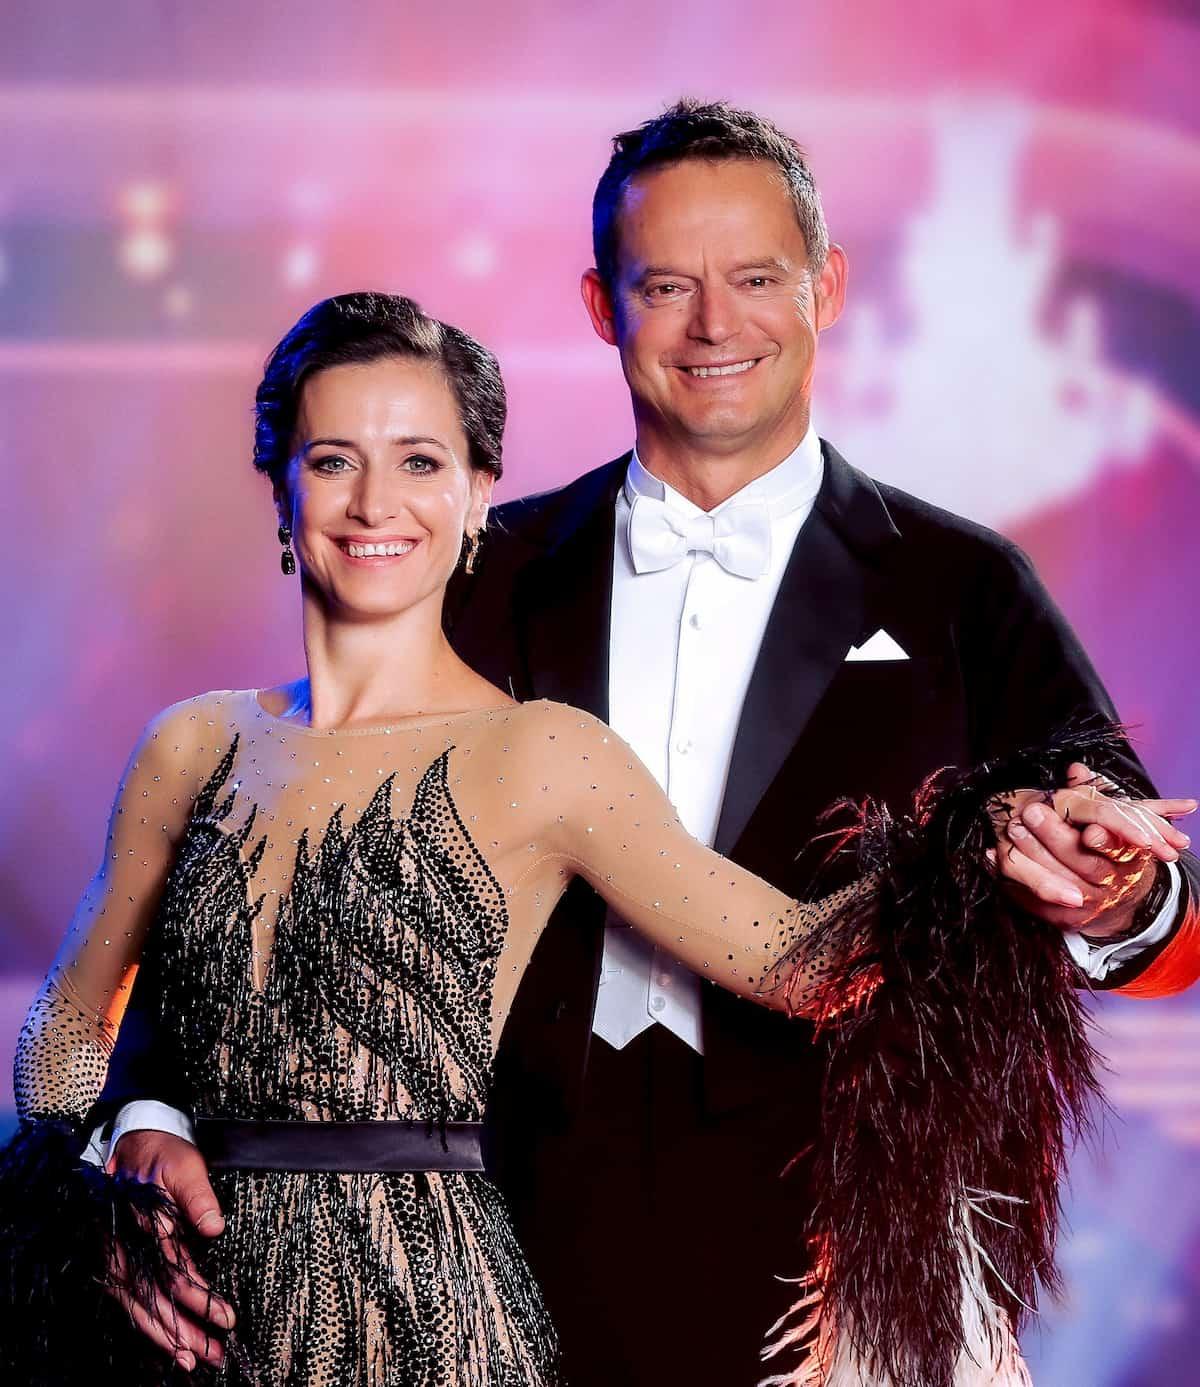 Otto Konrad - Lenka Pohoralek Dancing Stars am 24.9.2021